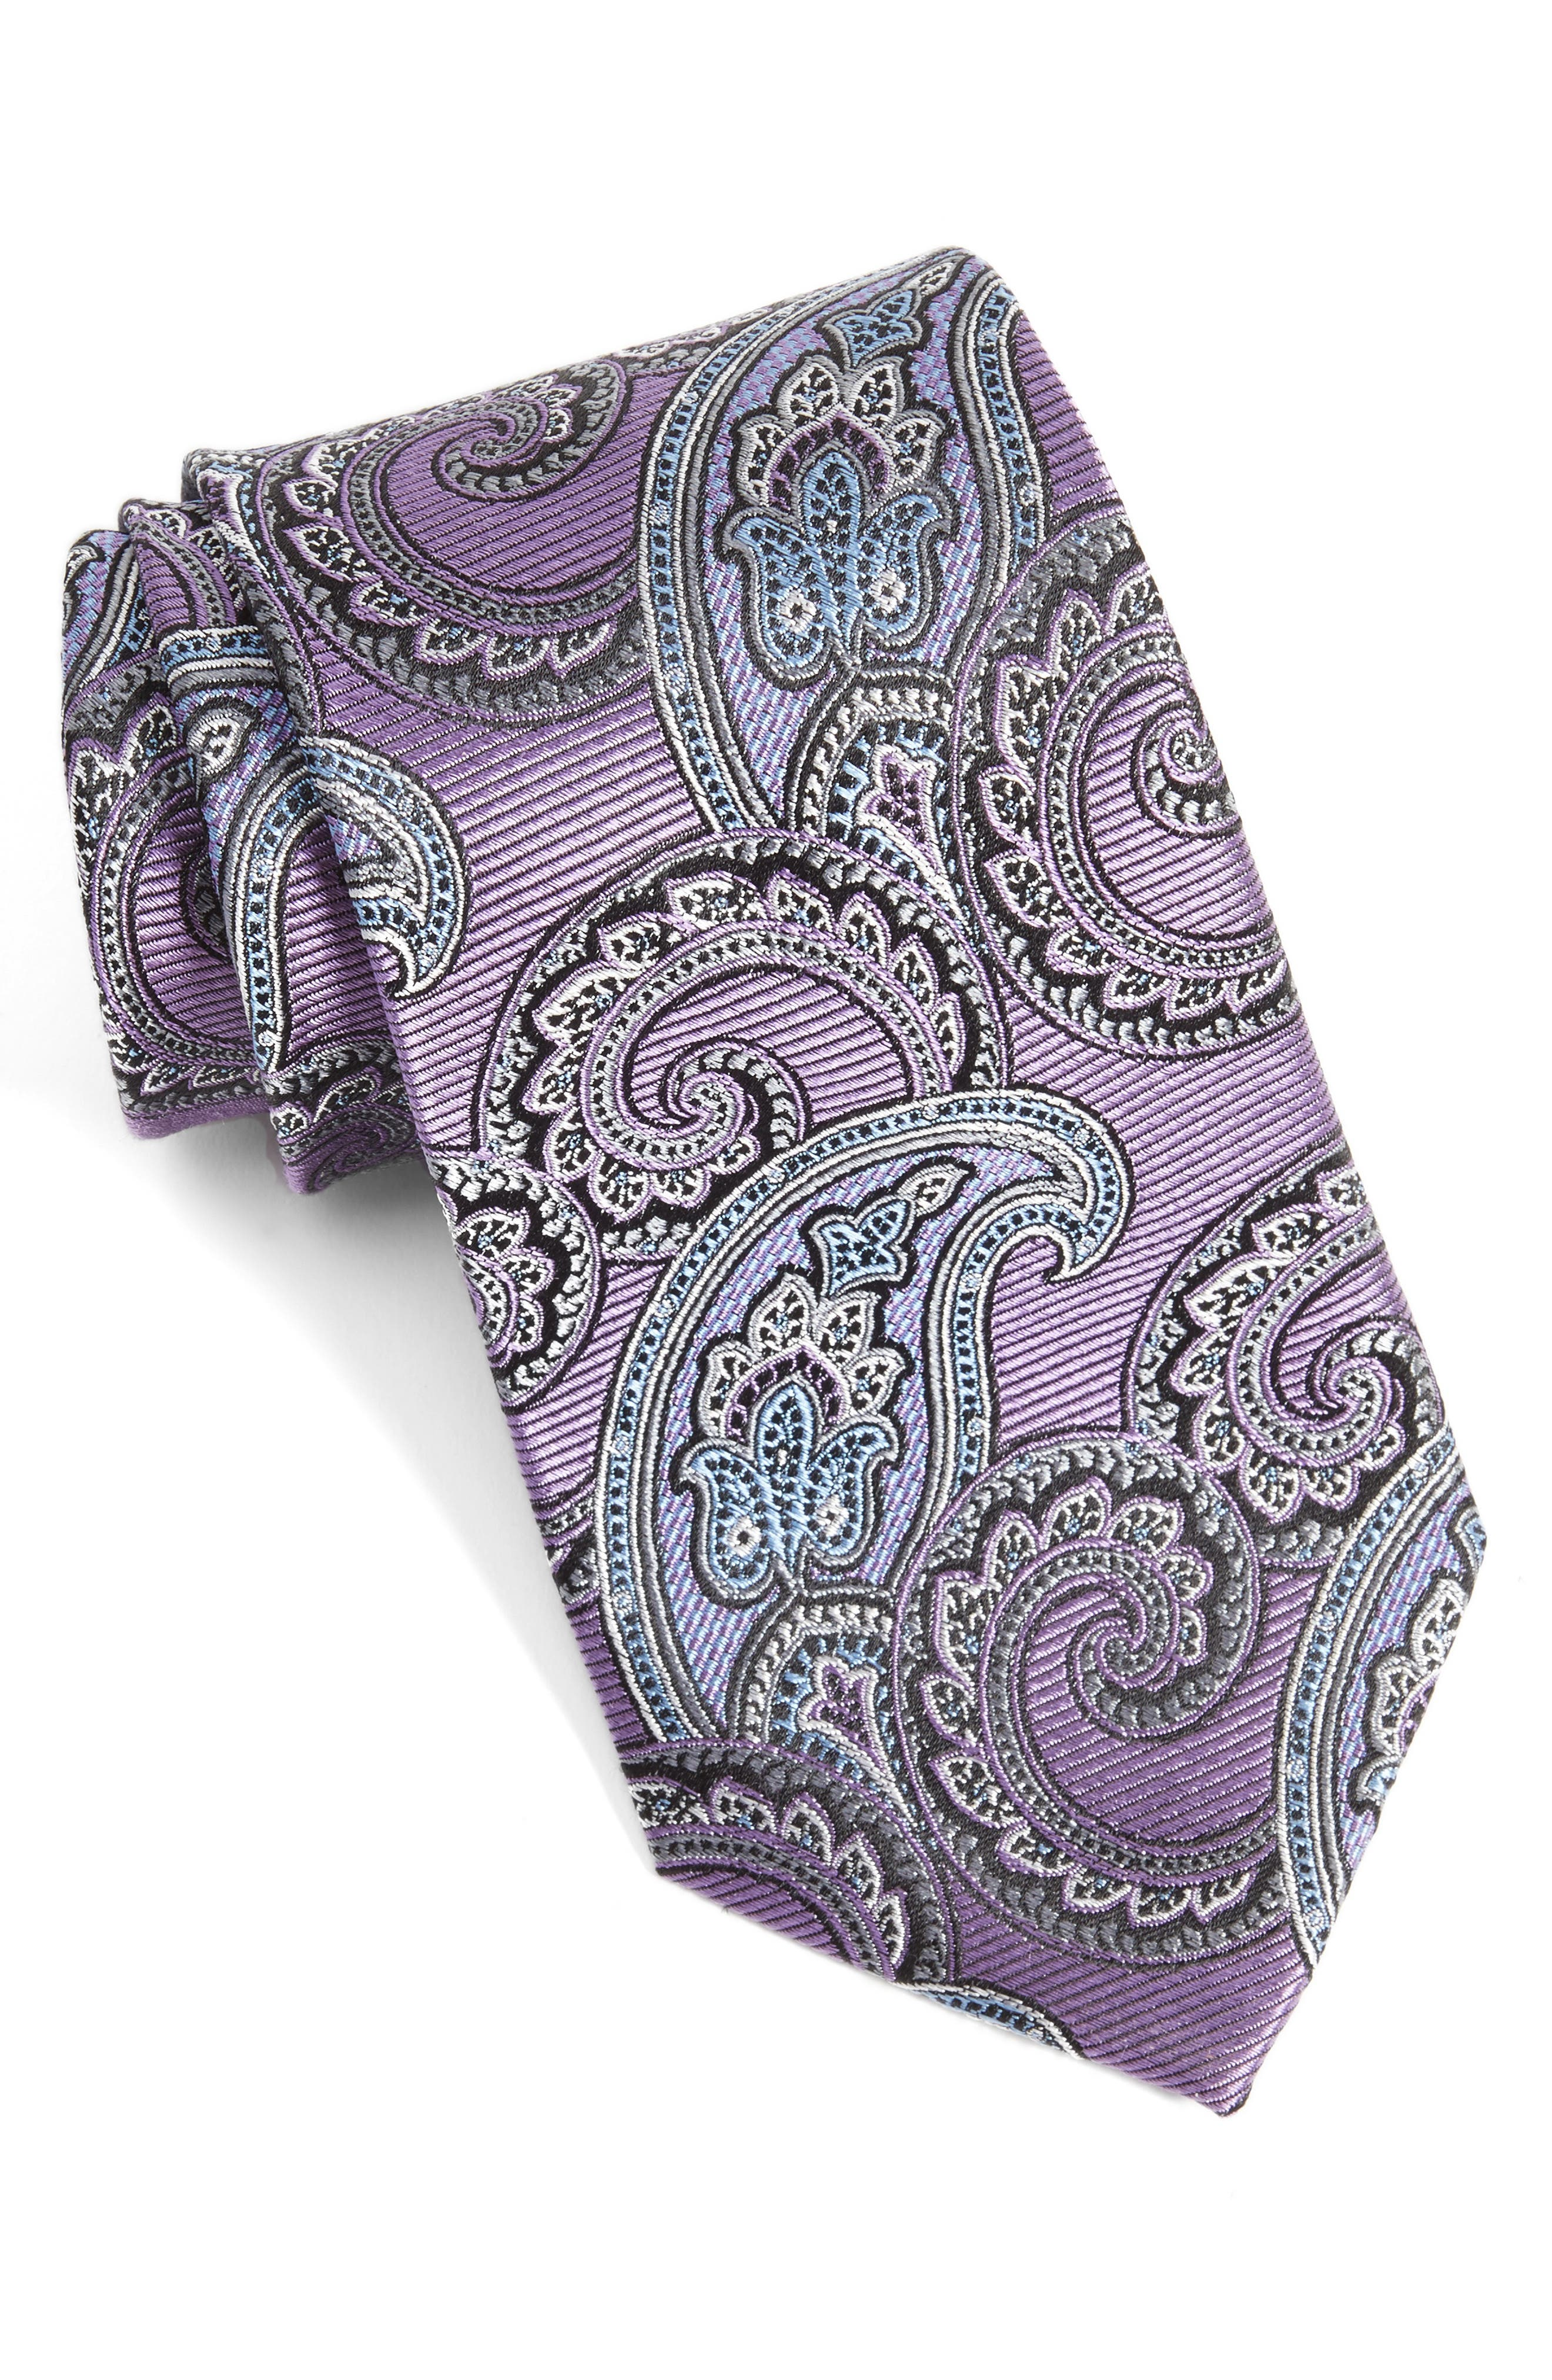 NORDSTROM MENS SHOP Nordstrom Paisley Silk Tie